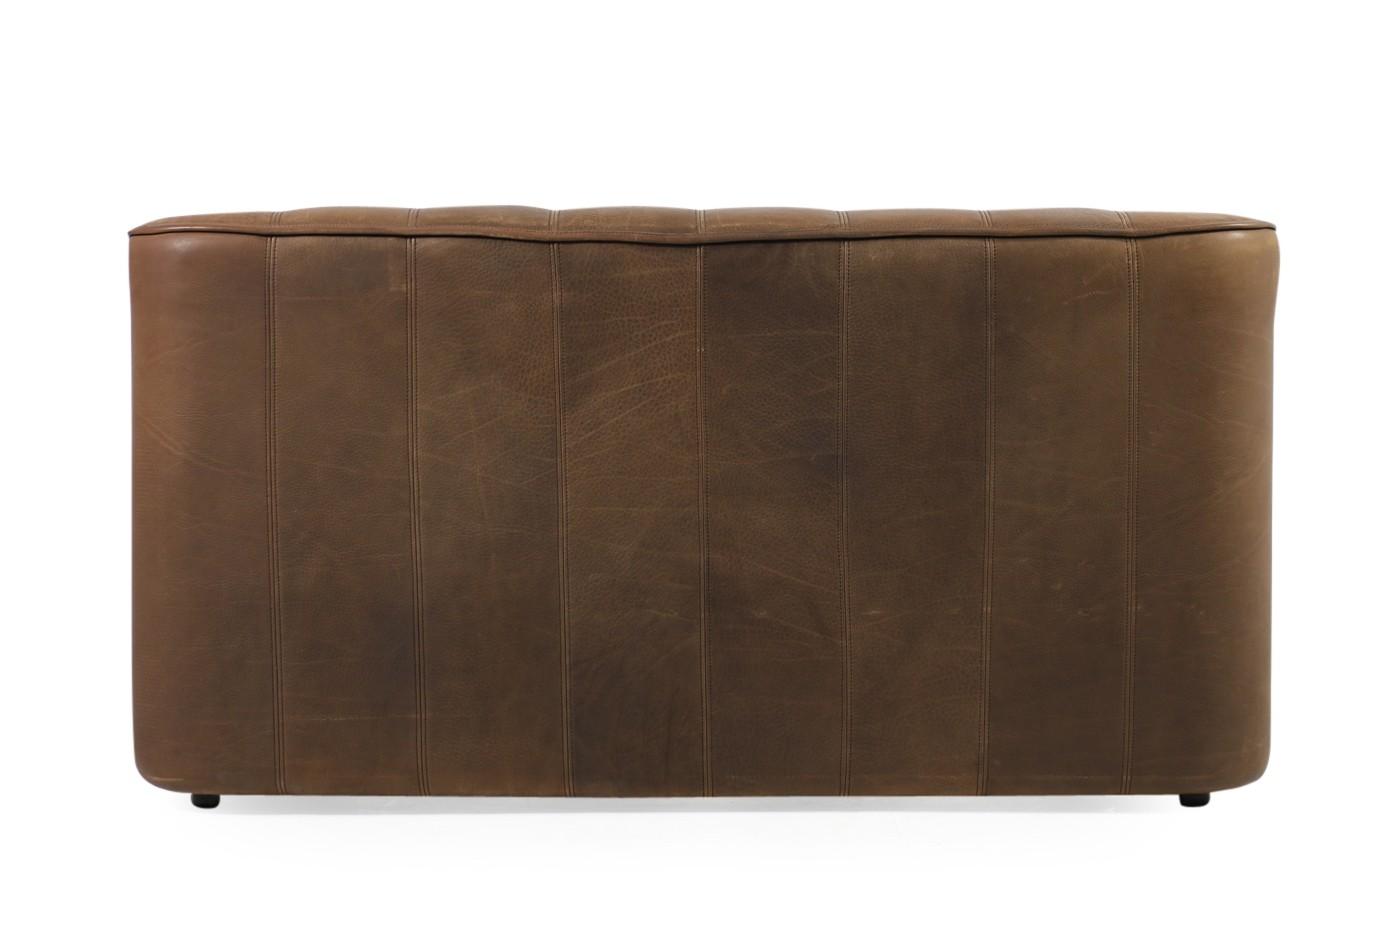 1970s vintage de sede ds 44 two seat sofa brown buffalo leather. Black Bedroom Furniture Sets. Home Design Ideas